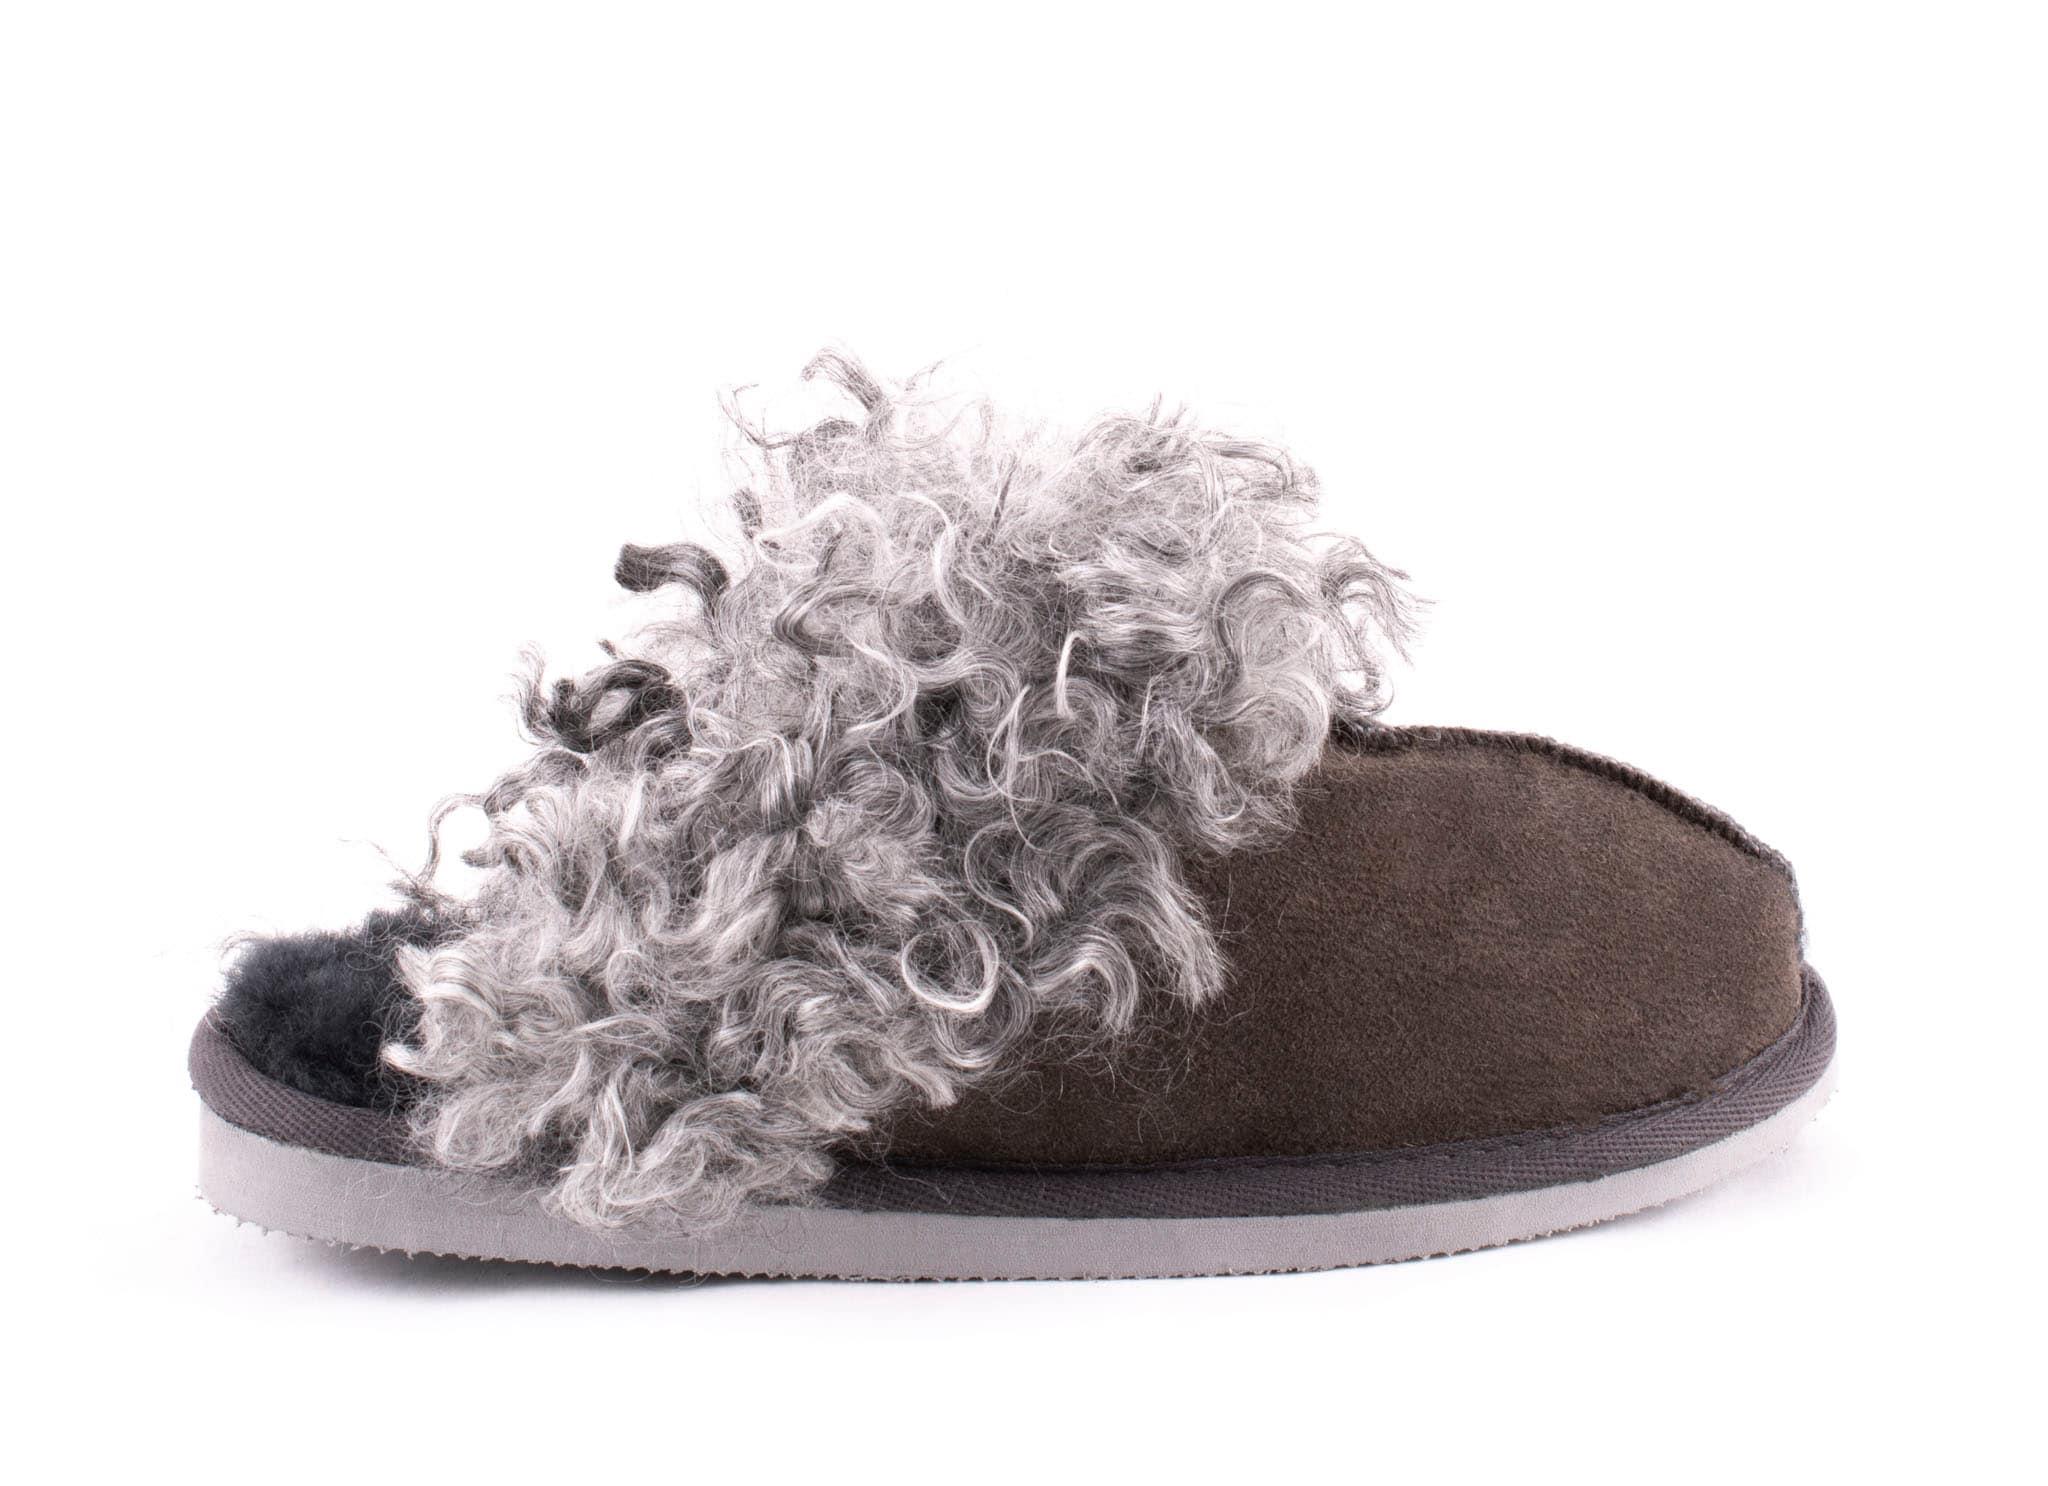 Tuva sheepskin slippers